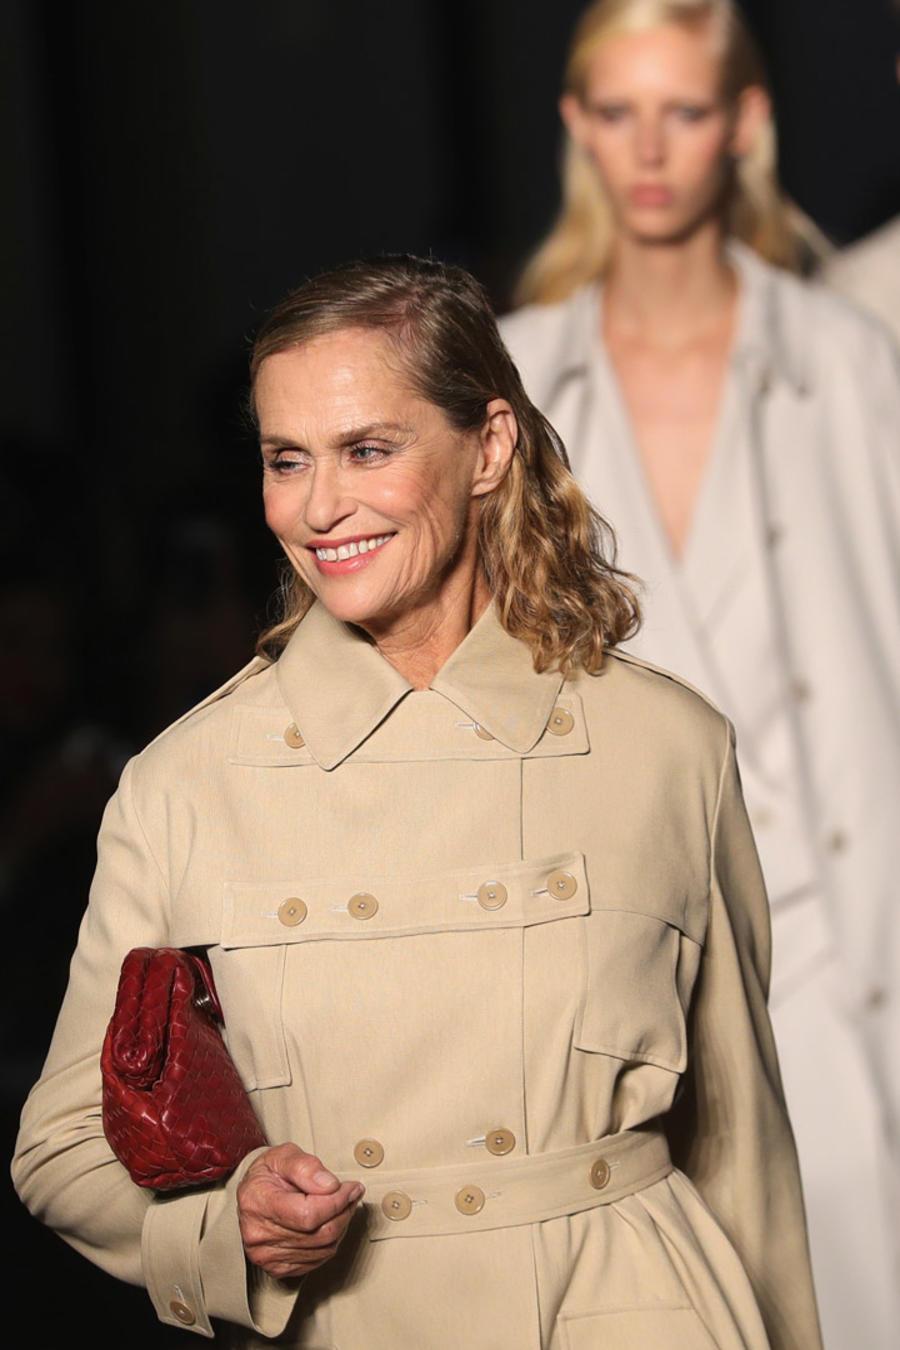 Lauren Hutton en el desfile de Bottega Veneta